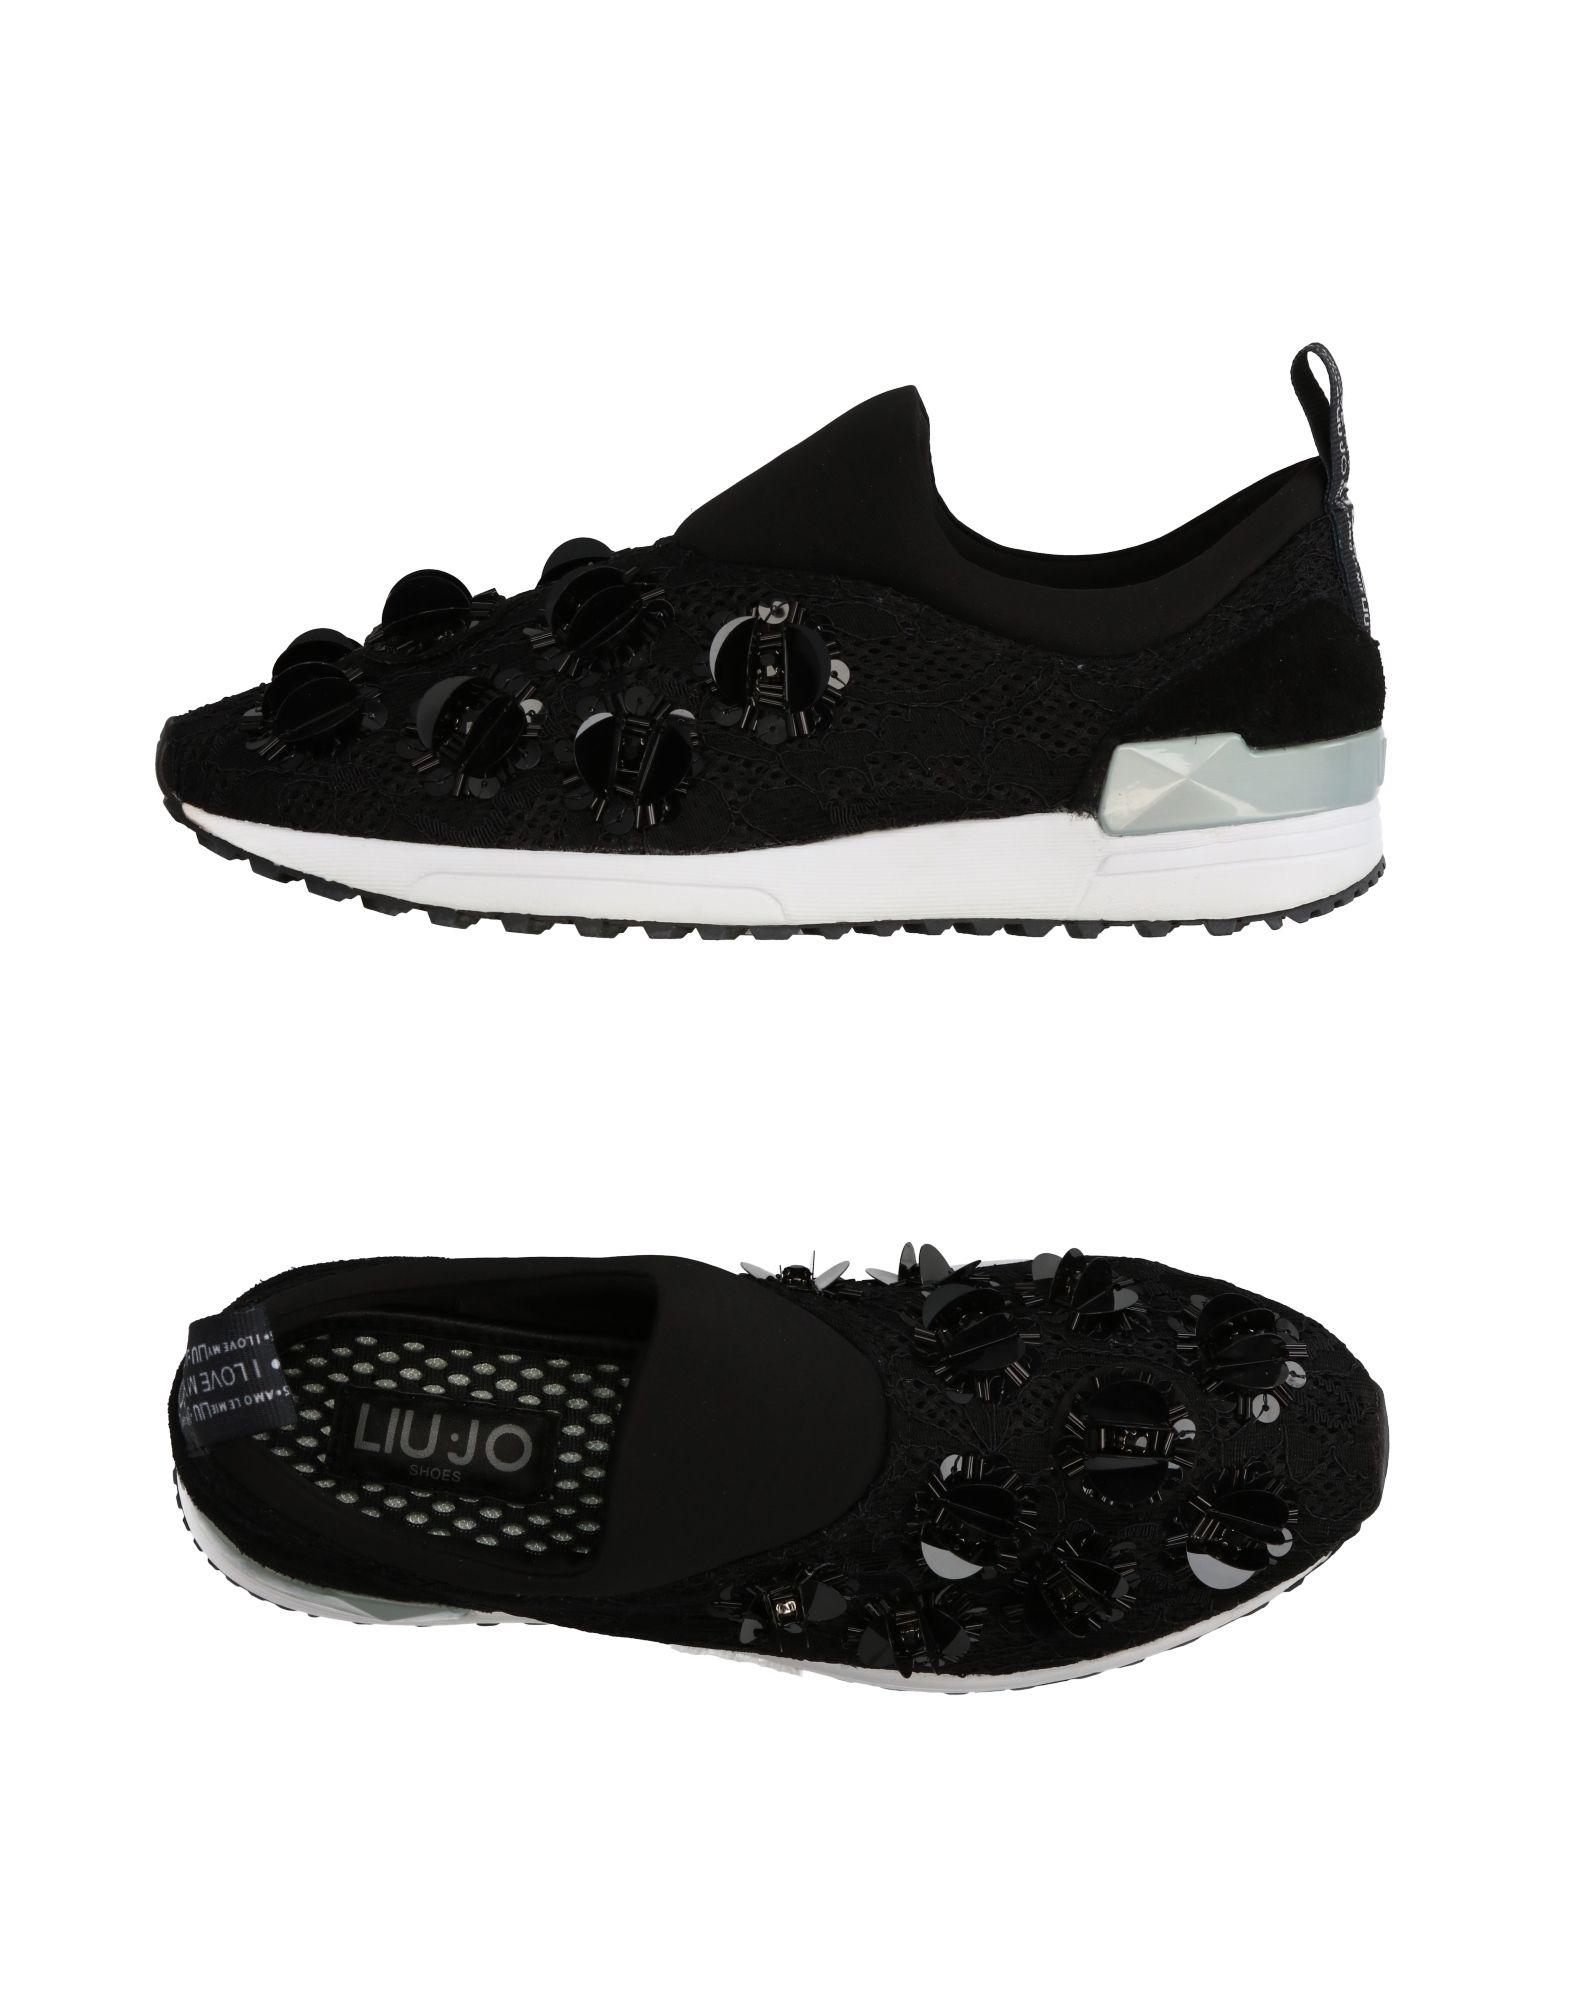 Liu •Jo Shoes Sneakers Damen  11270171GP Gute Qualität beliebte Schuhe